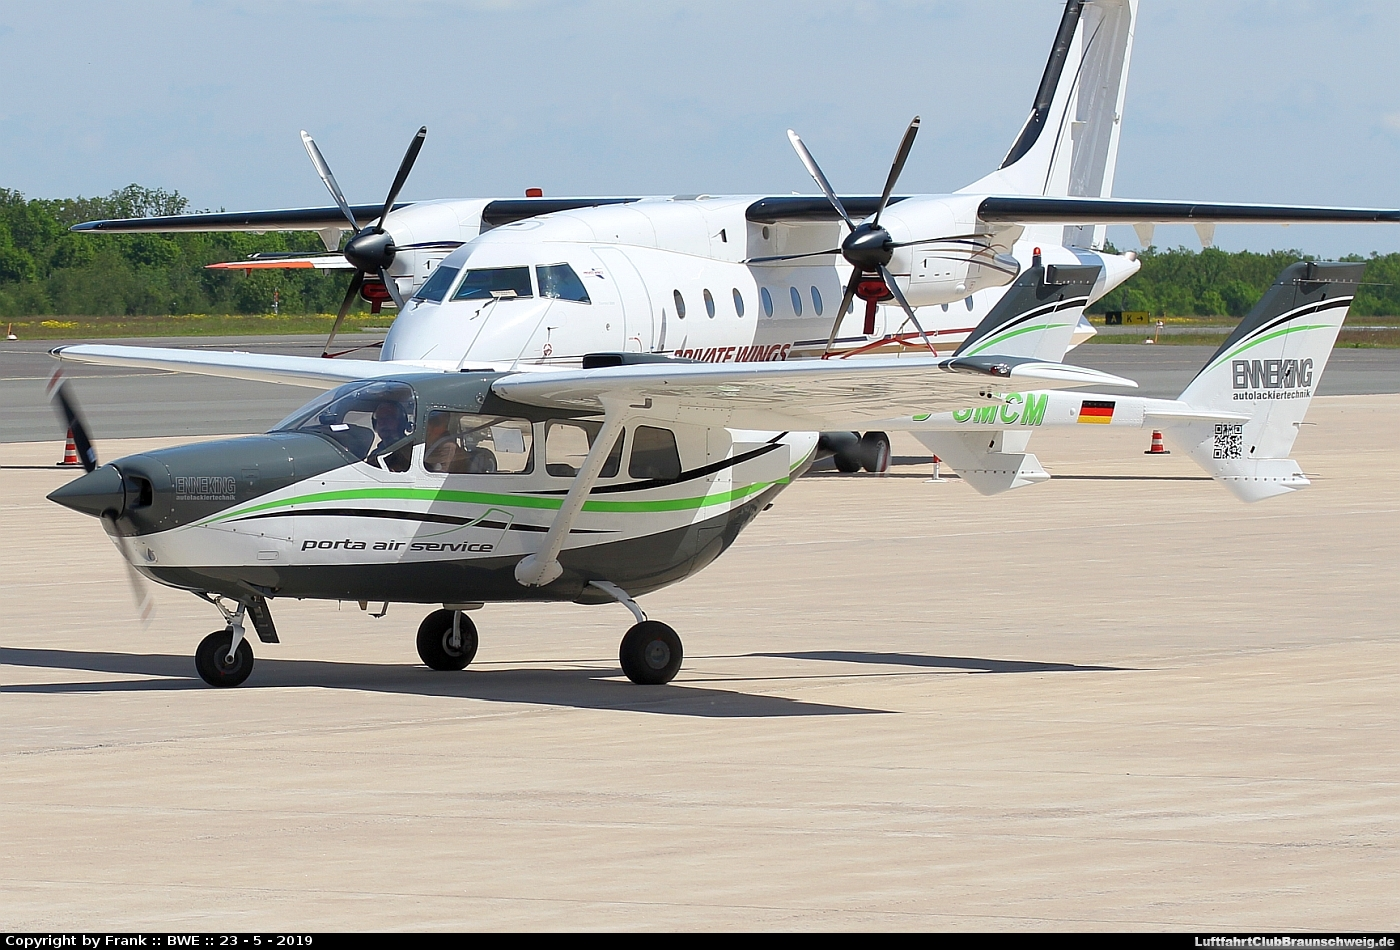 23 05 2019: Air Nostrum CRJ 900 EC-JZU u  a  - Luftfahrt Club